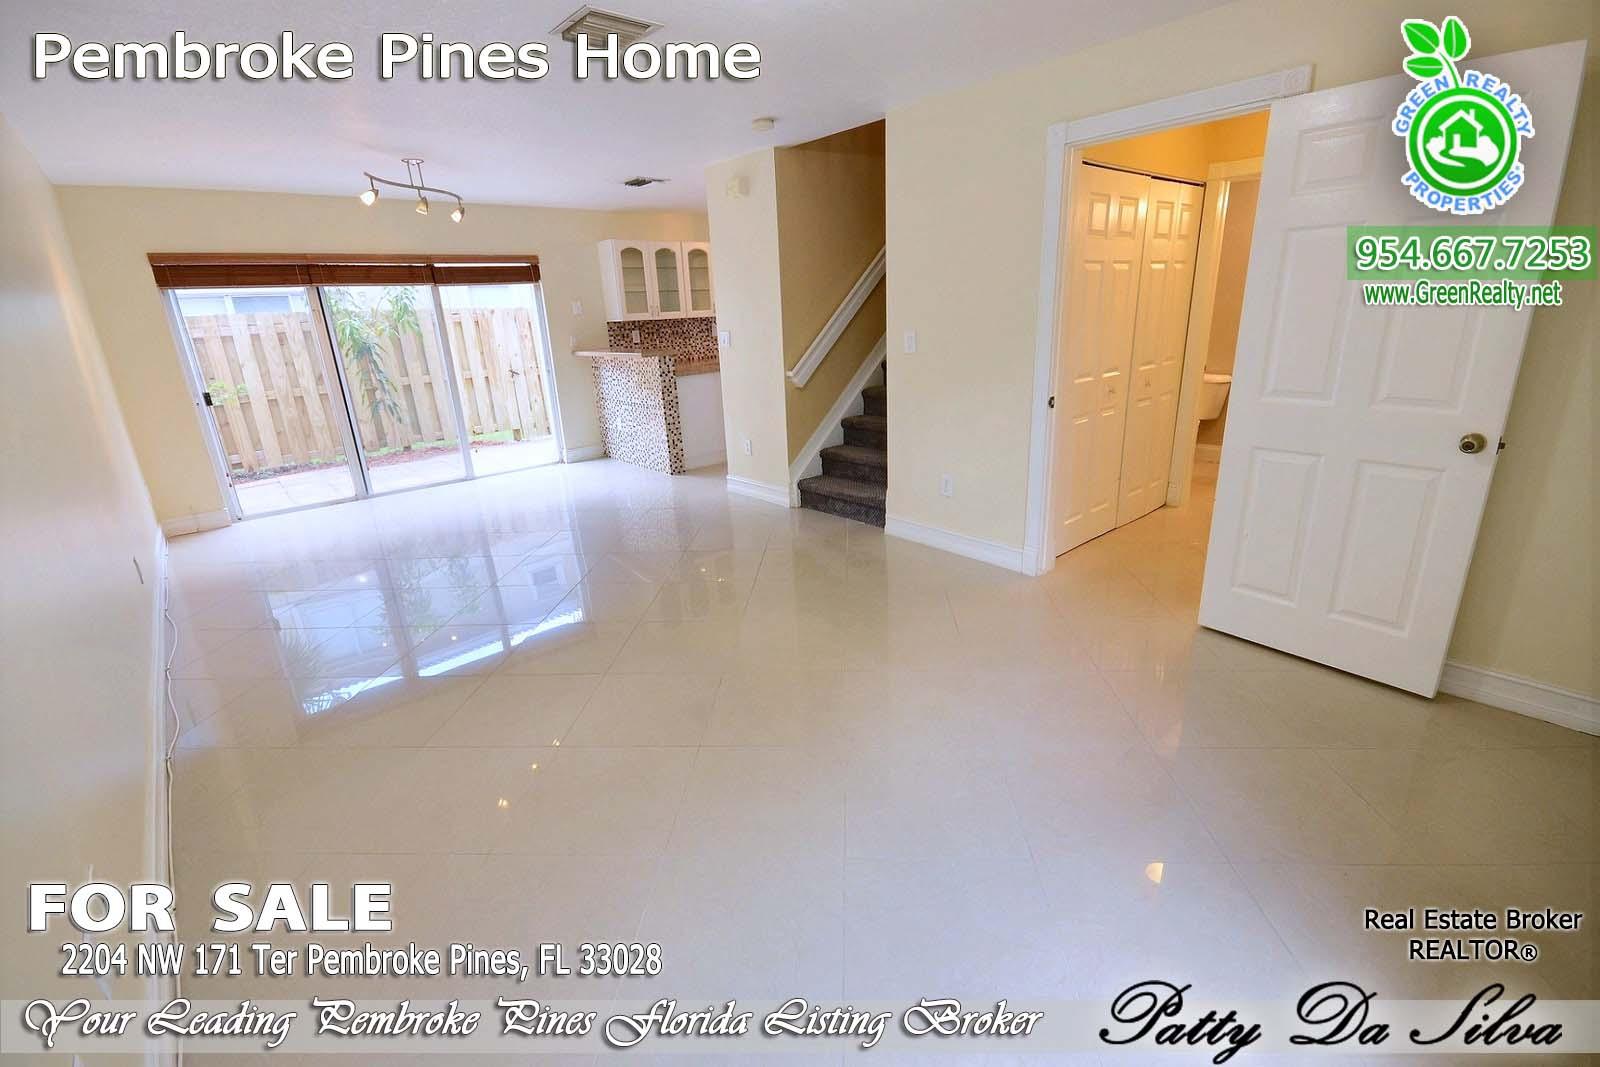 Pembroke Pines Homes For Sale - Pembroke Isles (9)